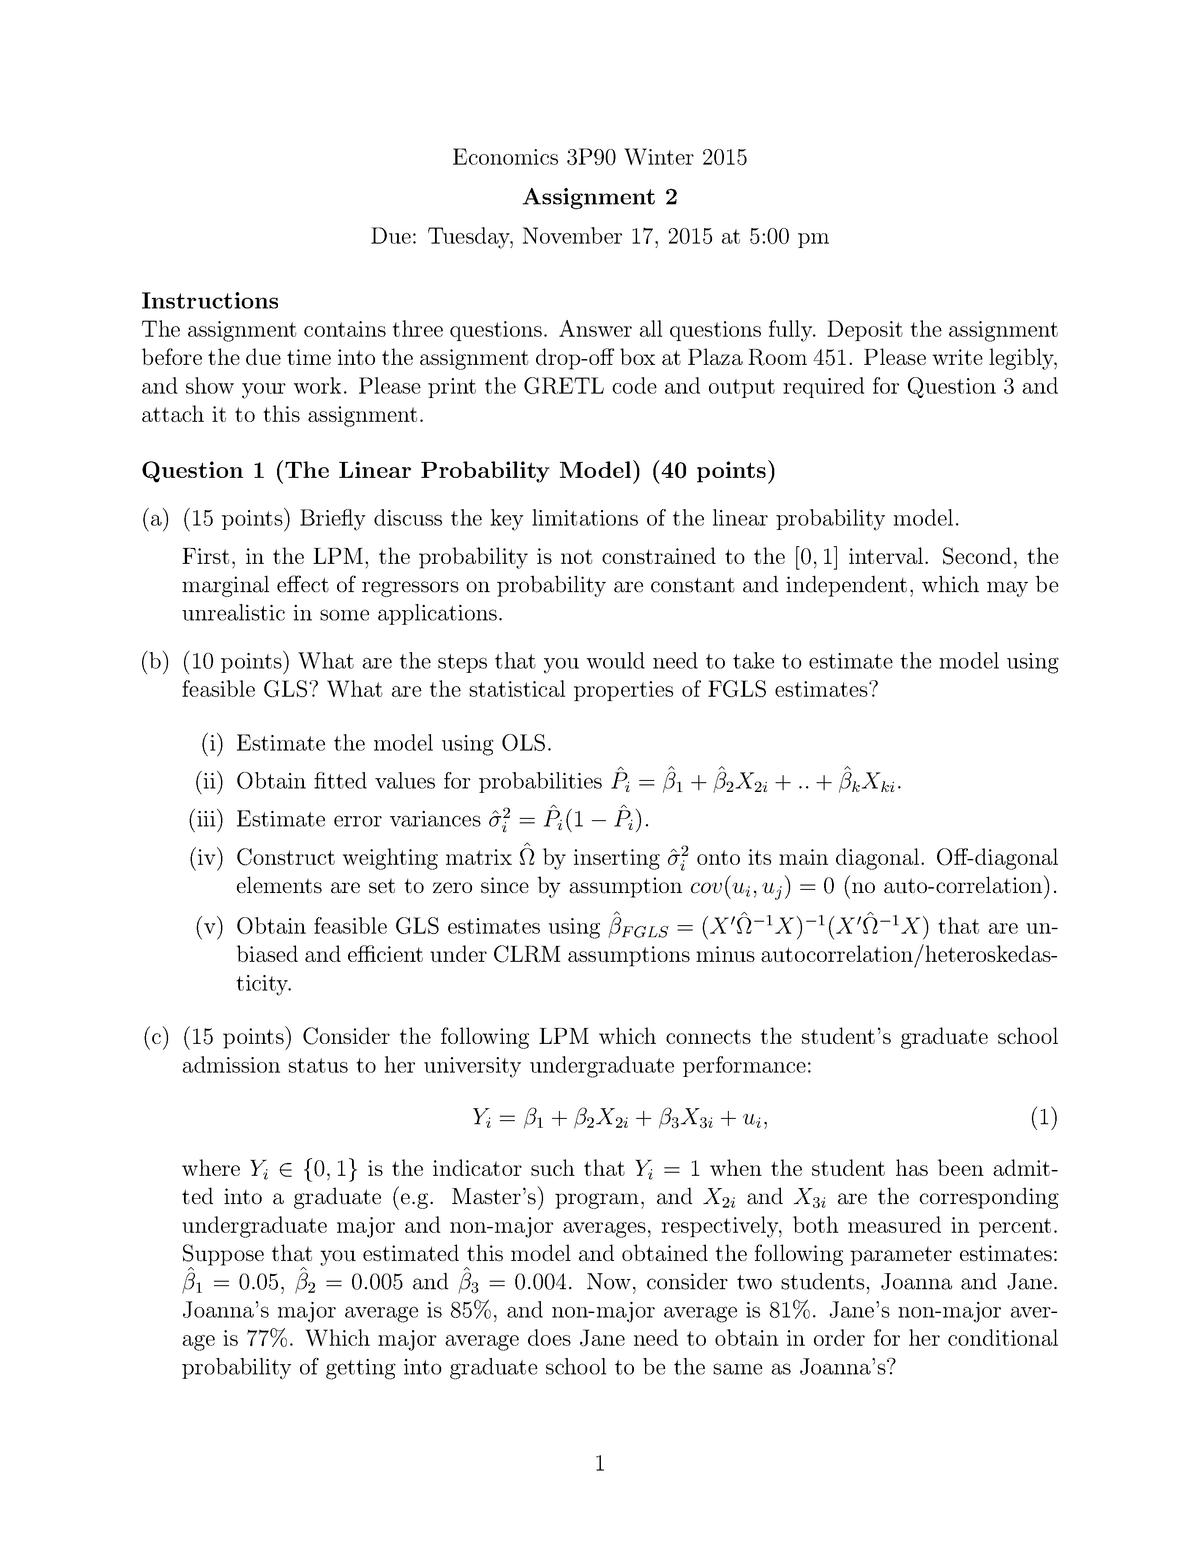 Assignment 2-Answers - ECON 3P90: Econometrics - StuDocu